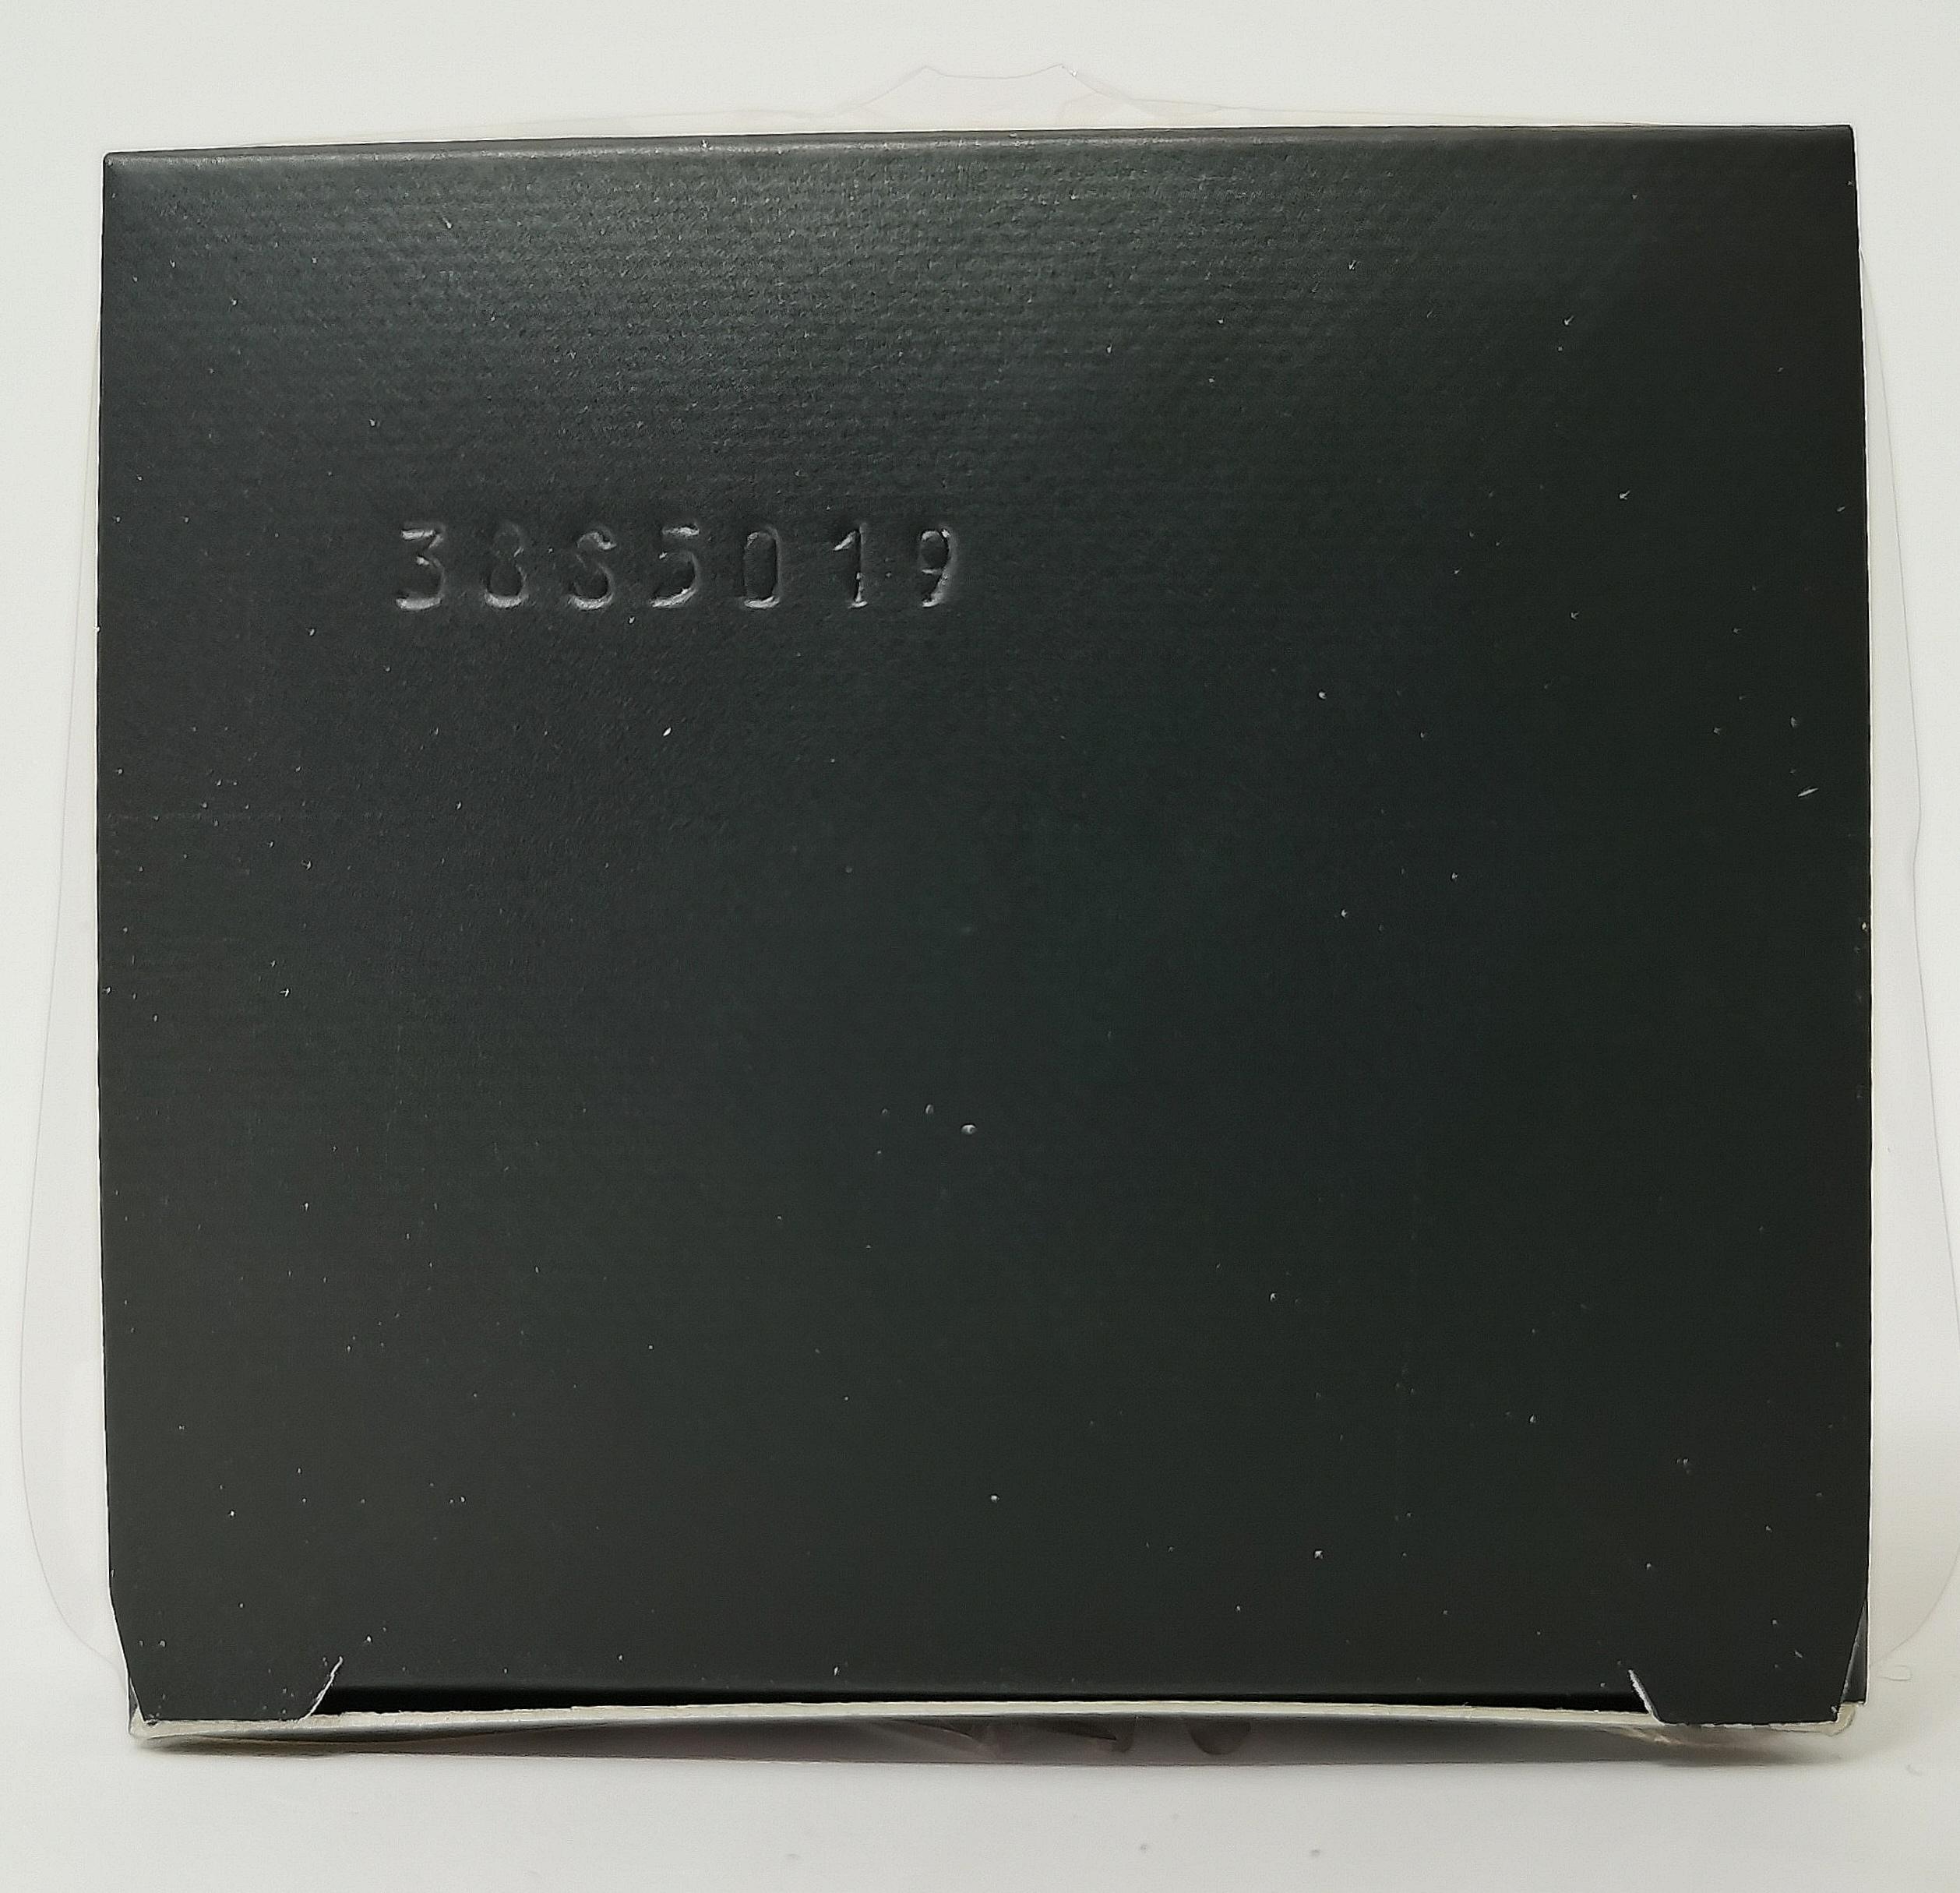 Парфюмерная вода 30 мл Yves Saint Laurent Mon Paris - фото батч-кода на коробке